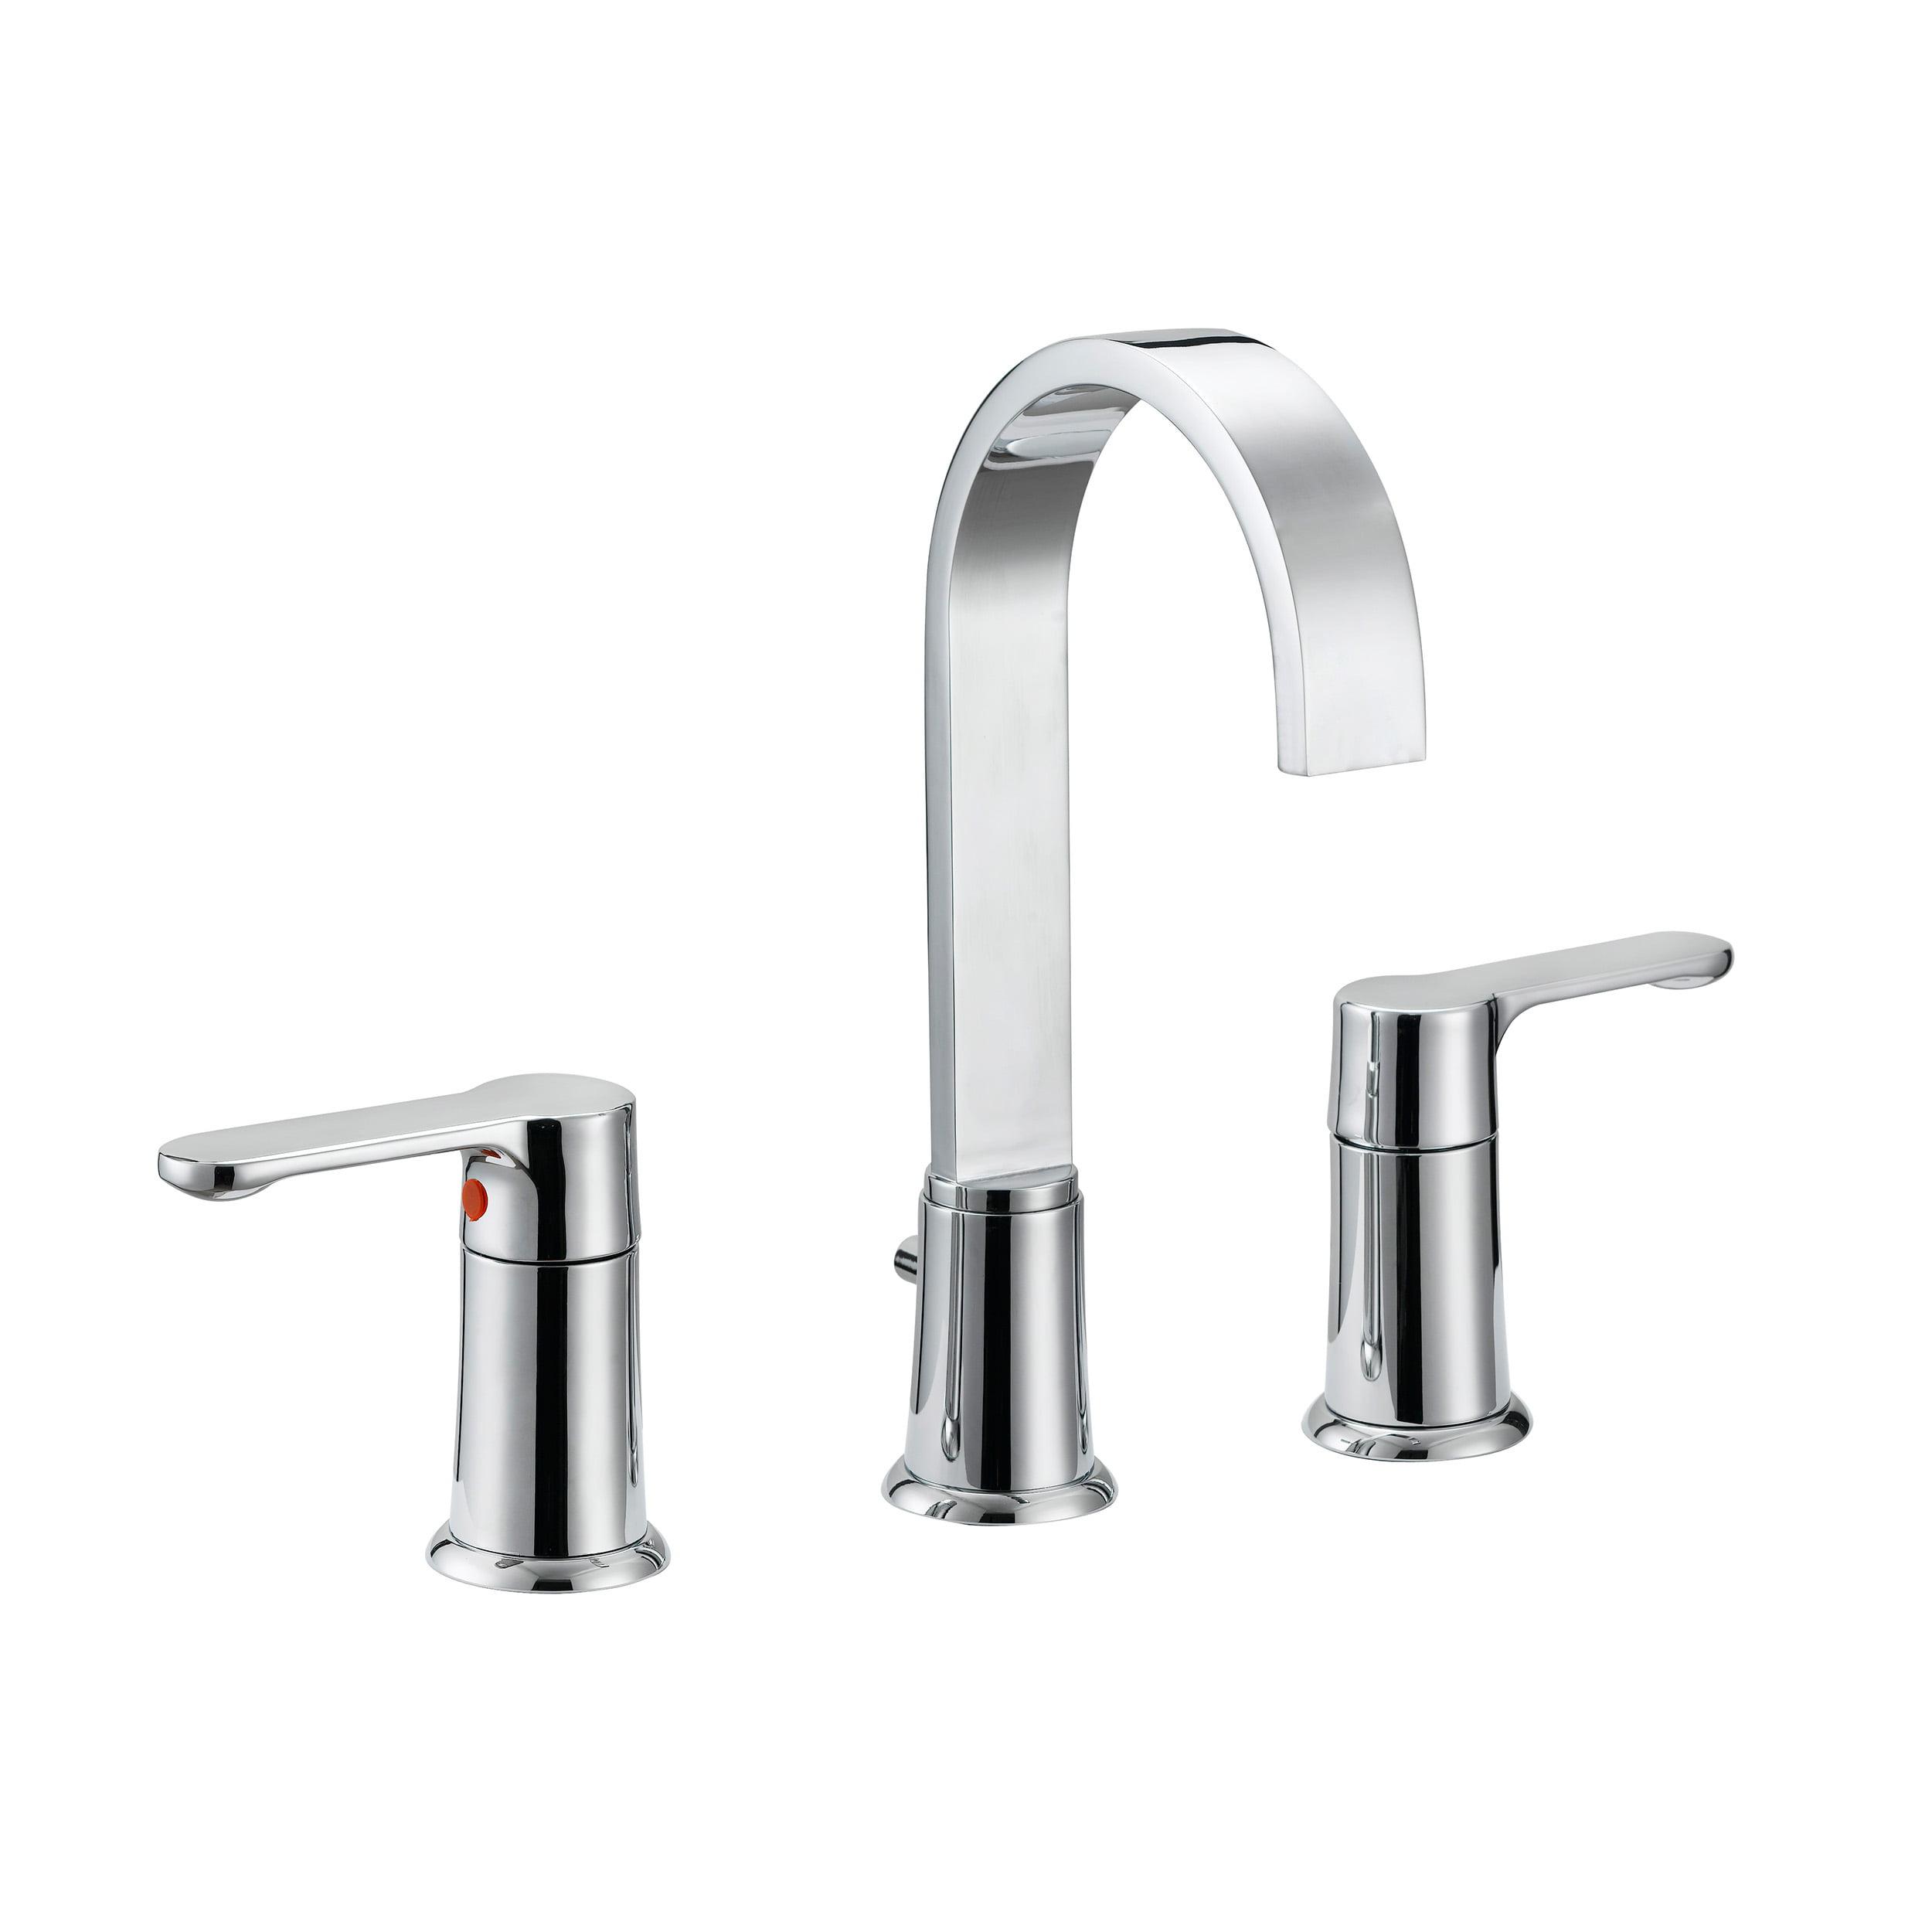 Safavieh Solea Placid Bathroom Faucet In Chrome Walmart Com Walmart Com